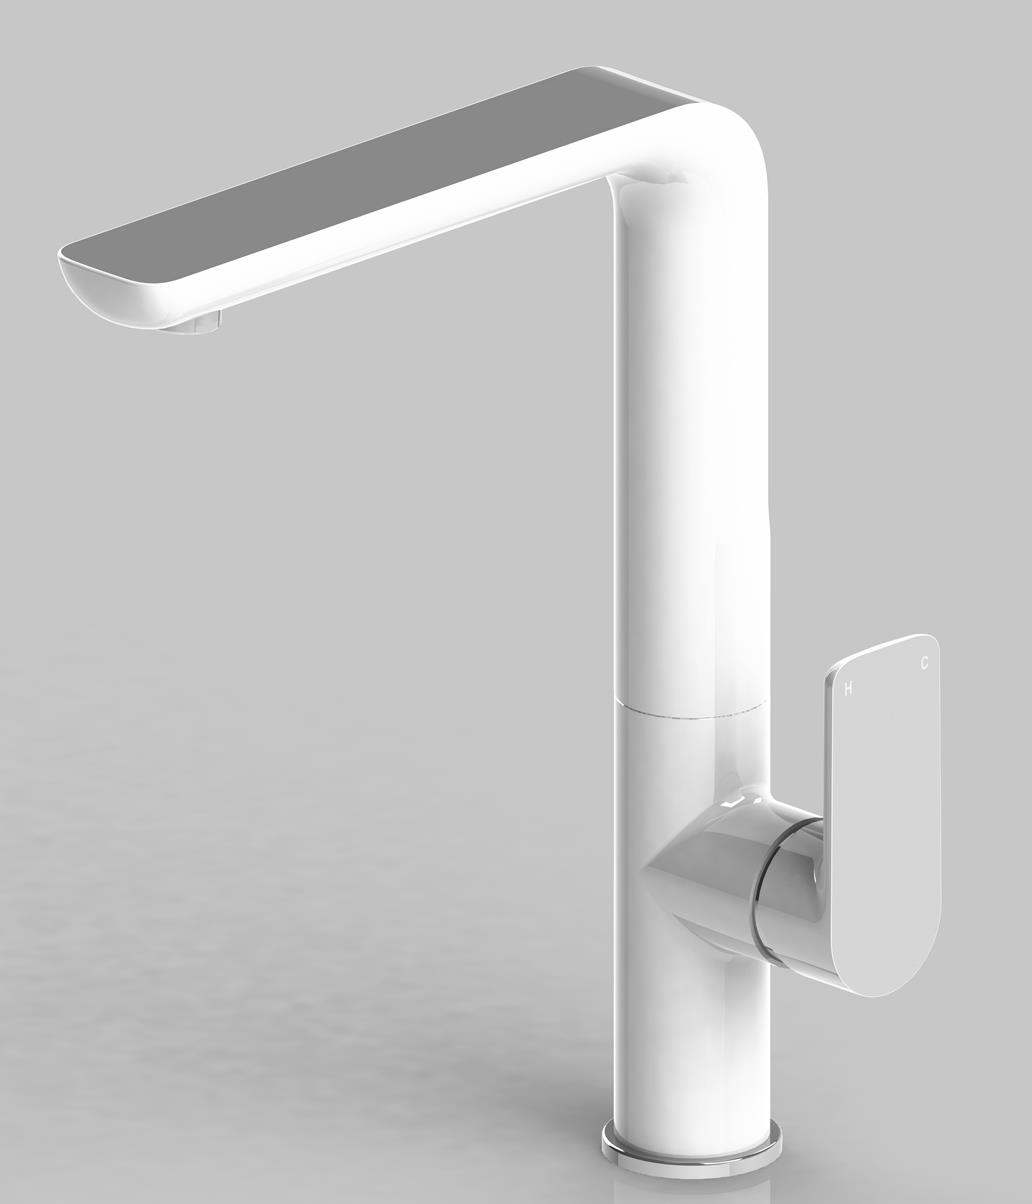 Ken S Plumbing Supplies Bathroom And Plumbing Supplies Bassini Sarre White Chrome Sink Mixer